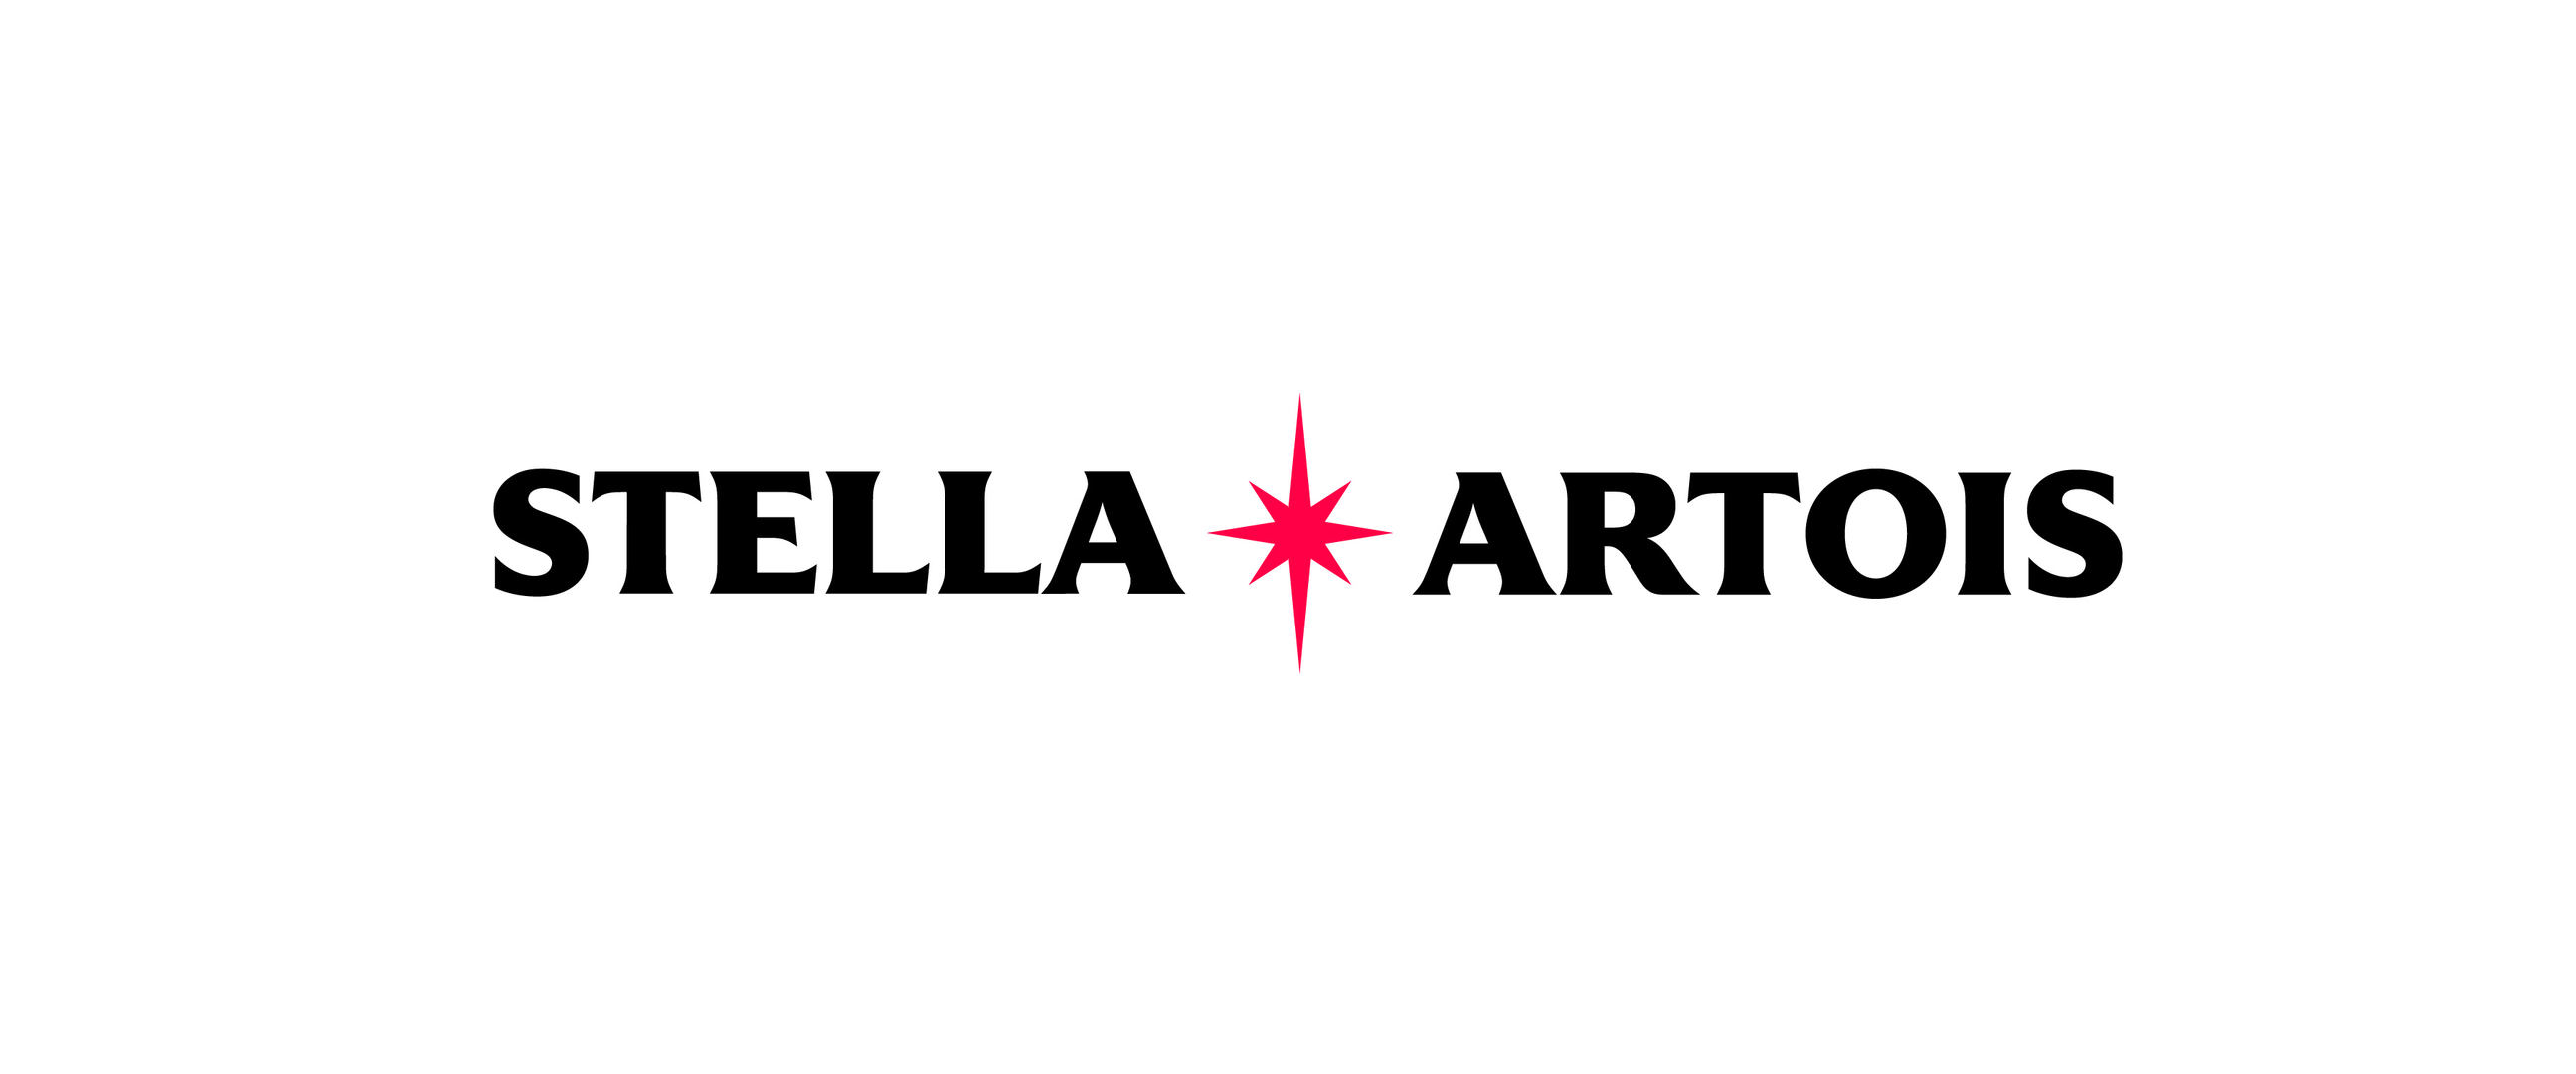 STELLA_ARTOIS_WORDMARK_CMYK.jpg